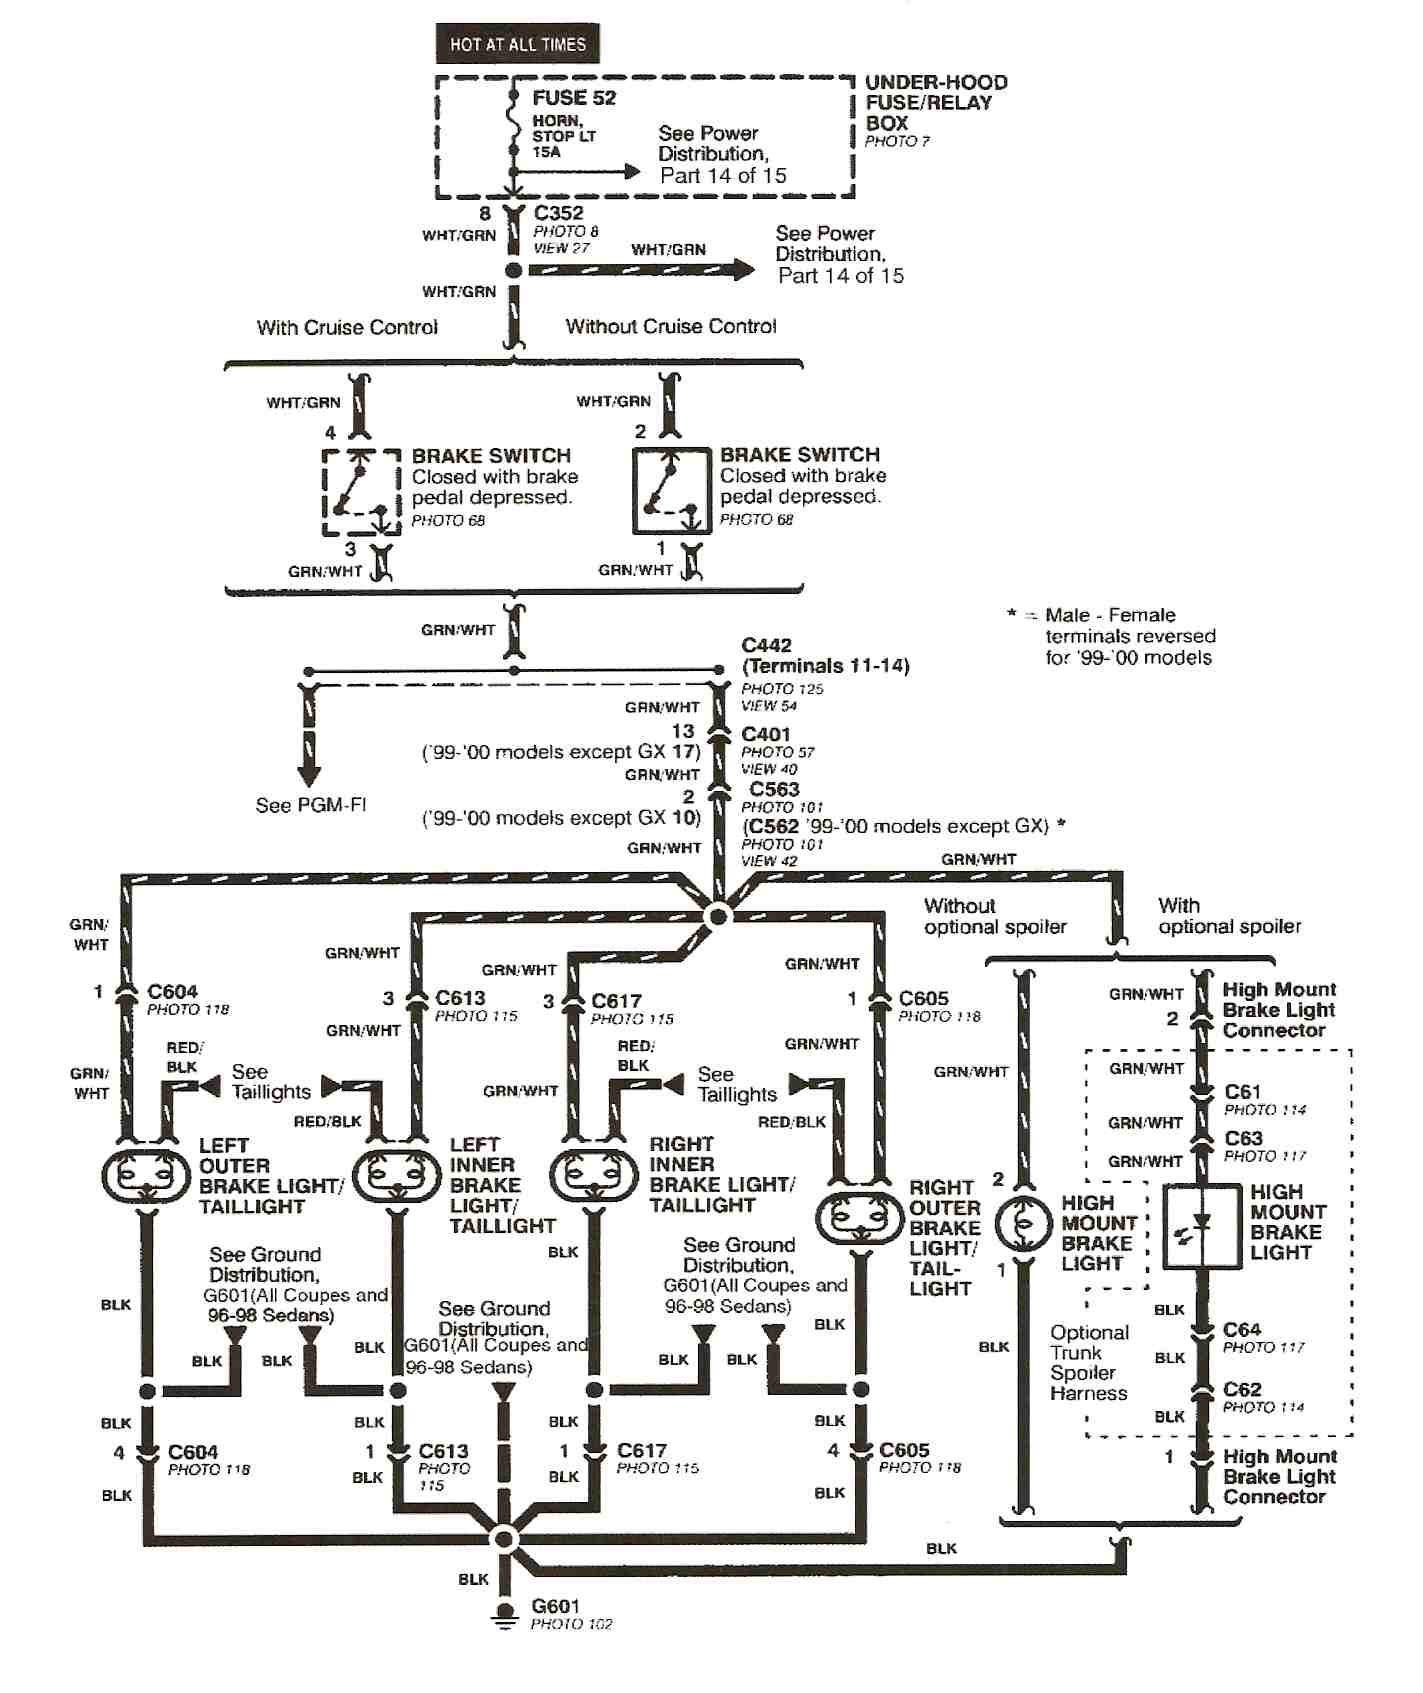 [WQZT_9871]  NZ_8768] 2006 Honda Civic Si Radio Wiring Diagram On 2009 Honda Pilot  Trailer Schematic Wiring | 2007 Civic Si Wiring Diagram |  | Stica Trons Mohammedshrine Librar Wiring 101